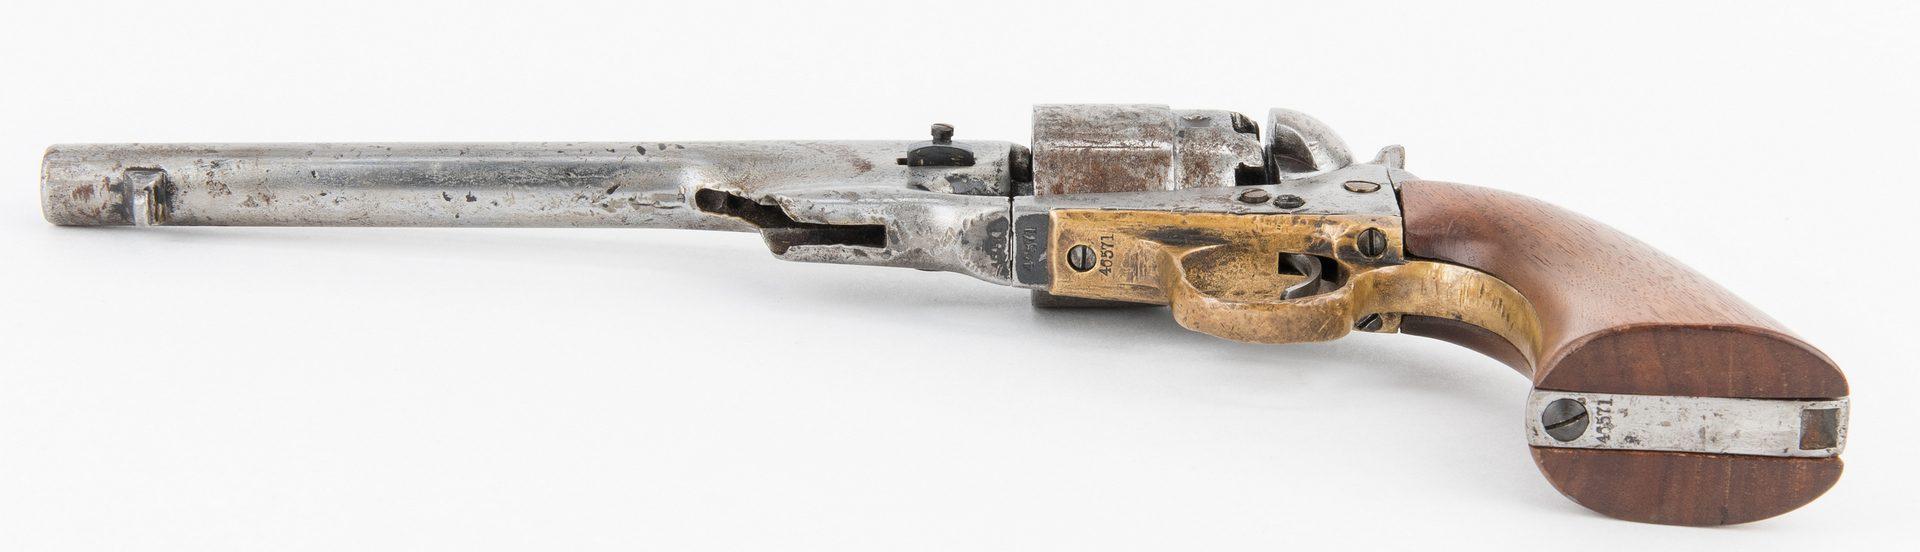 Lot 777: 2 Mid 19th Century Hand Guns, incl. Sharps, Colt